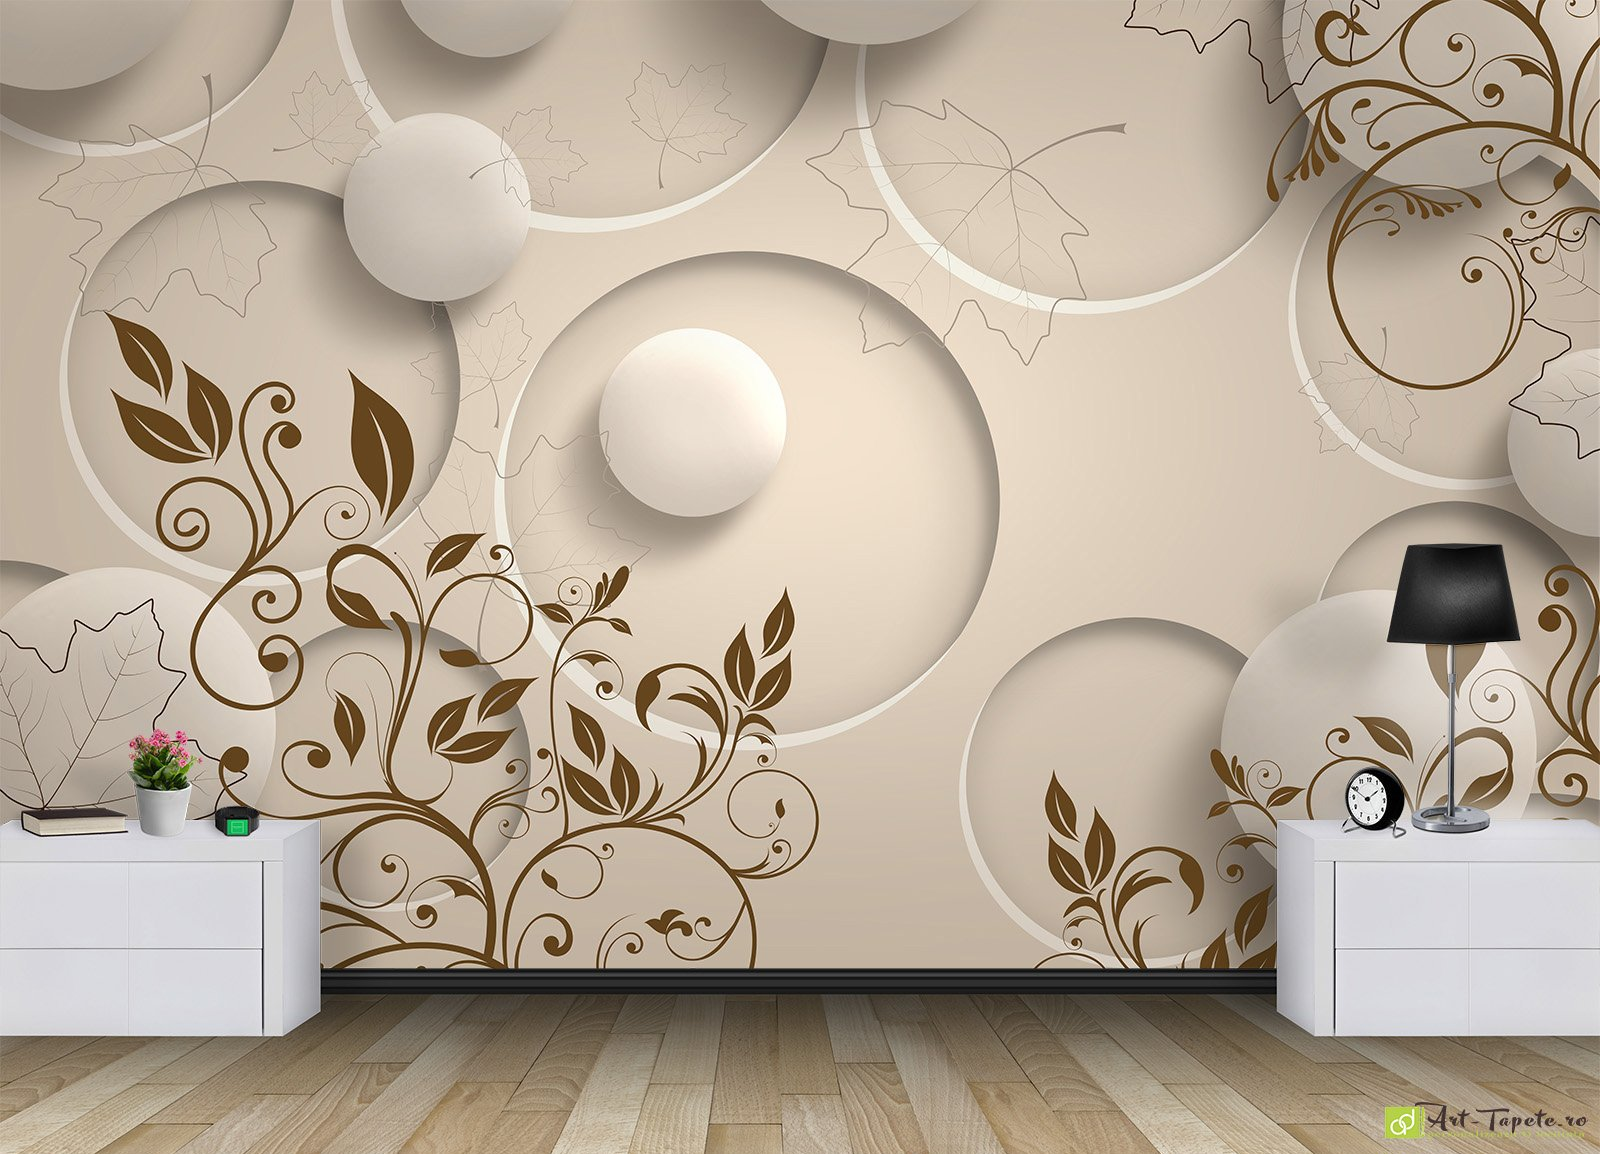 photo wallpaper 3d effect - circles_3 | fototapet.art amazing 3d